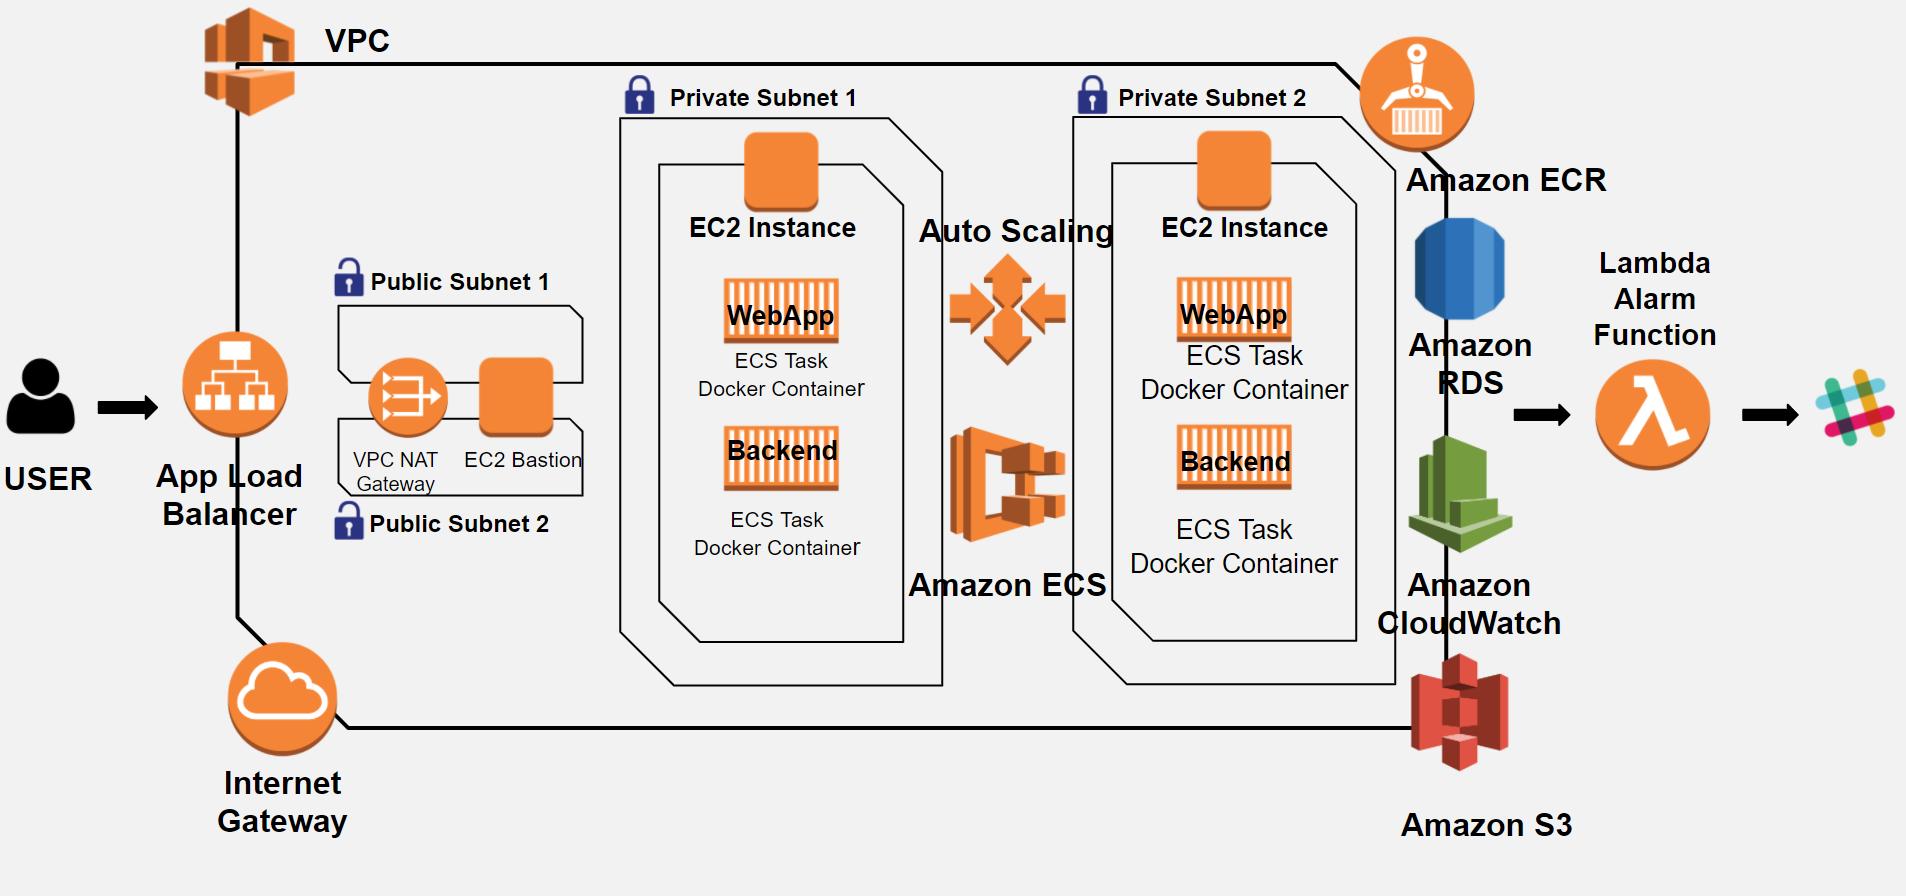 EZOps Standard Solution Diagram